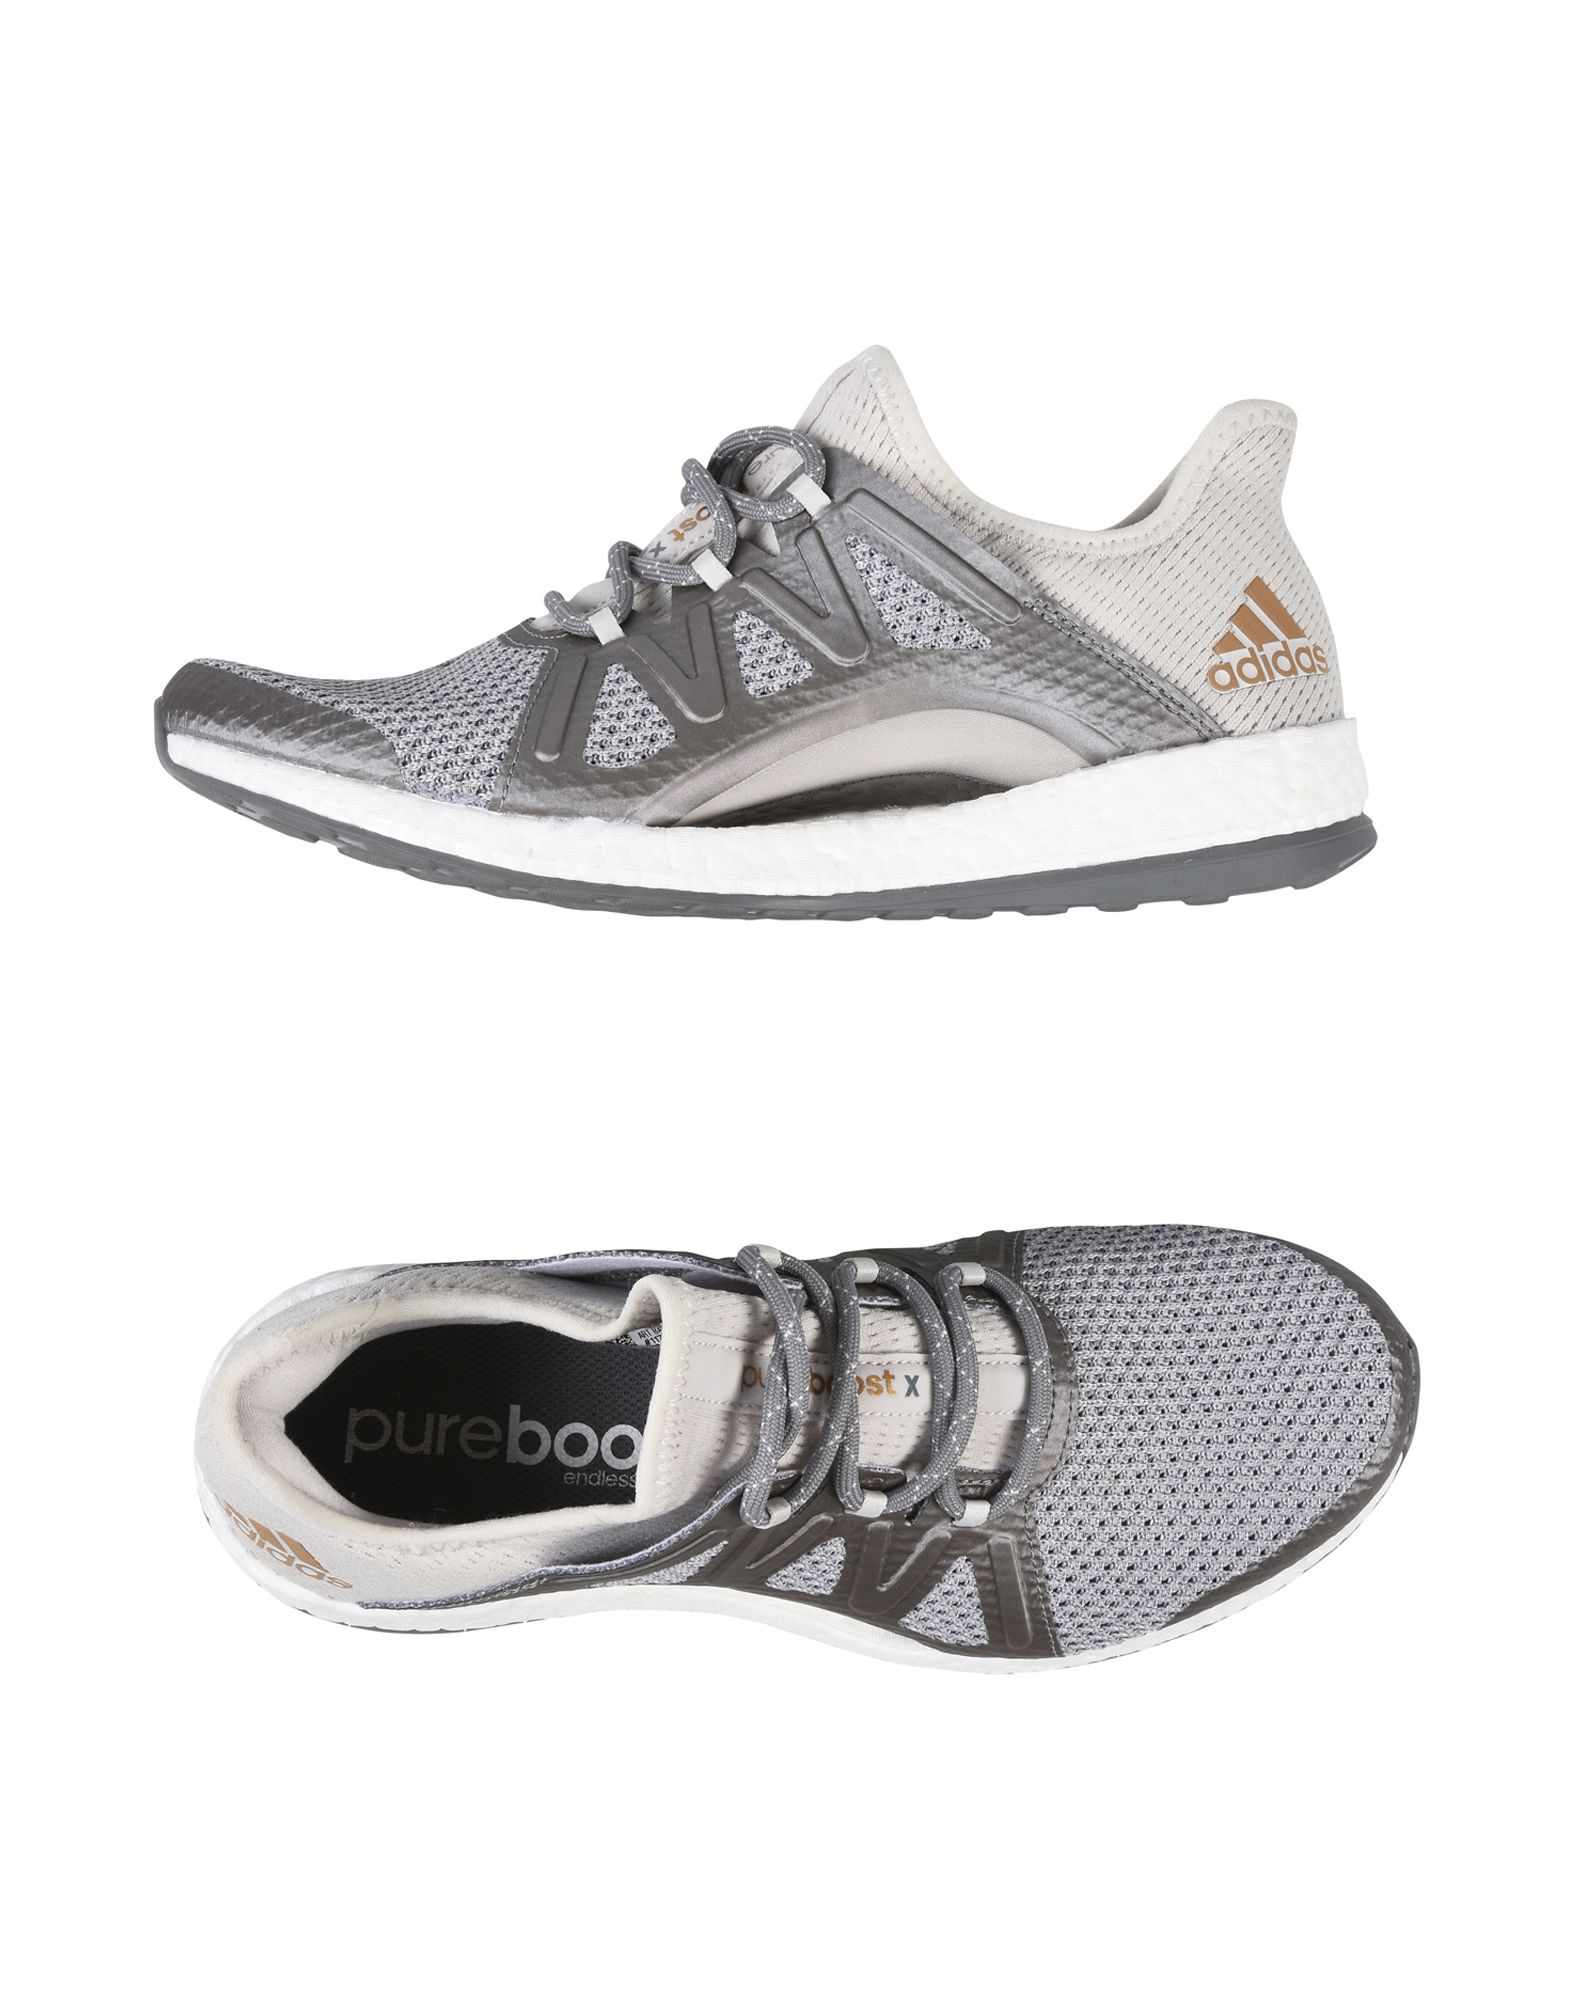 Sneakers Adidas Pureboost Expose - Femme - Sneakers Adidas sur